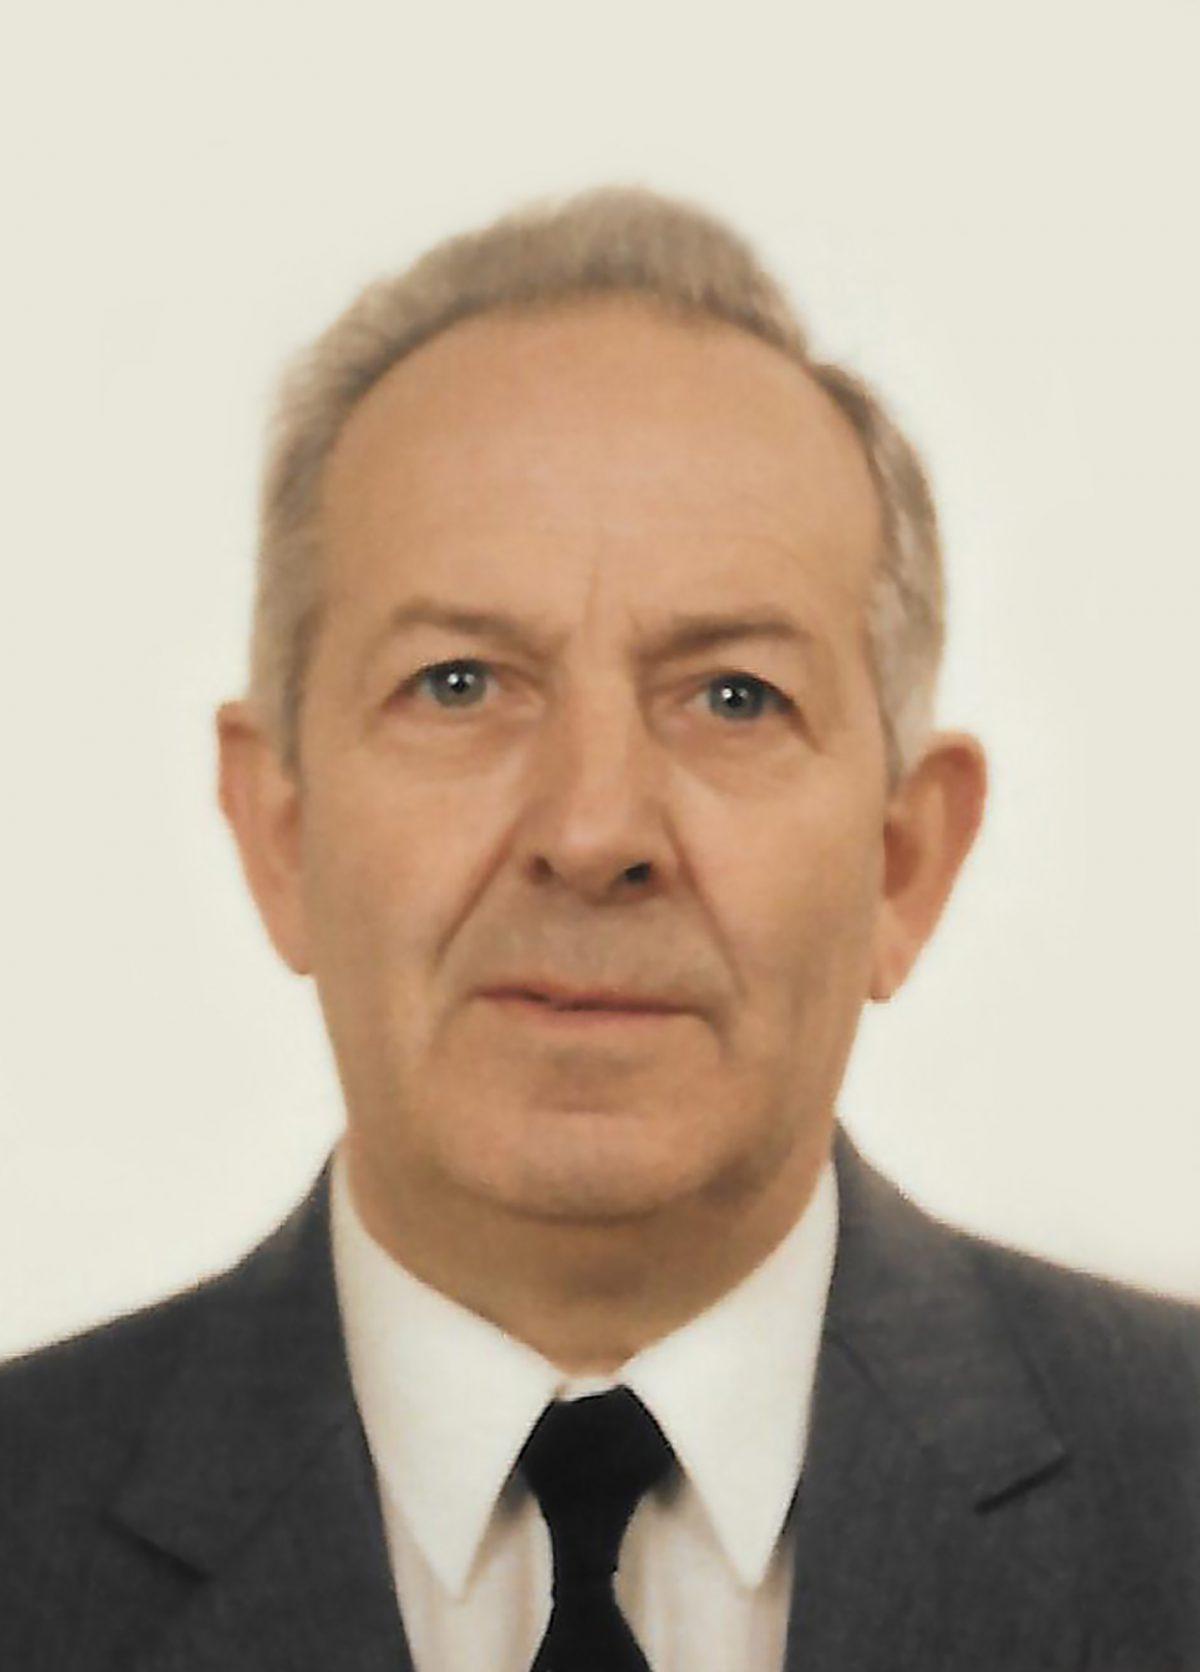 Jan Duchateau